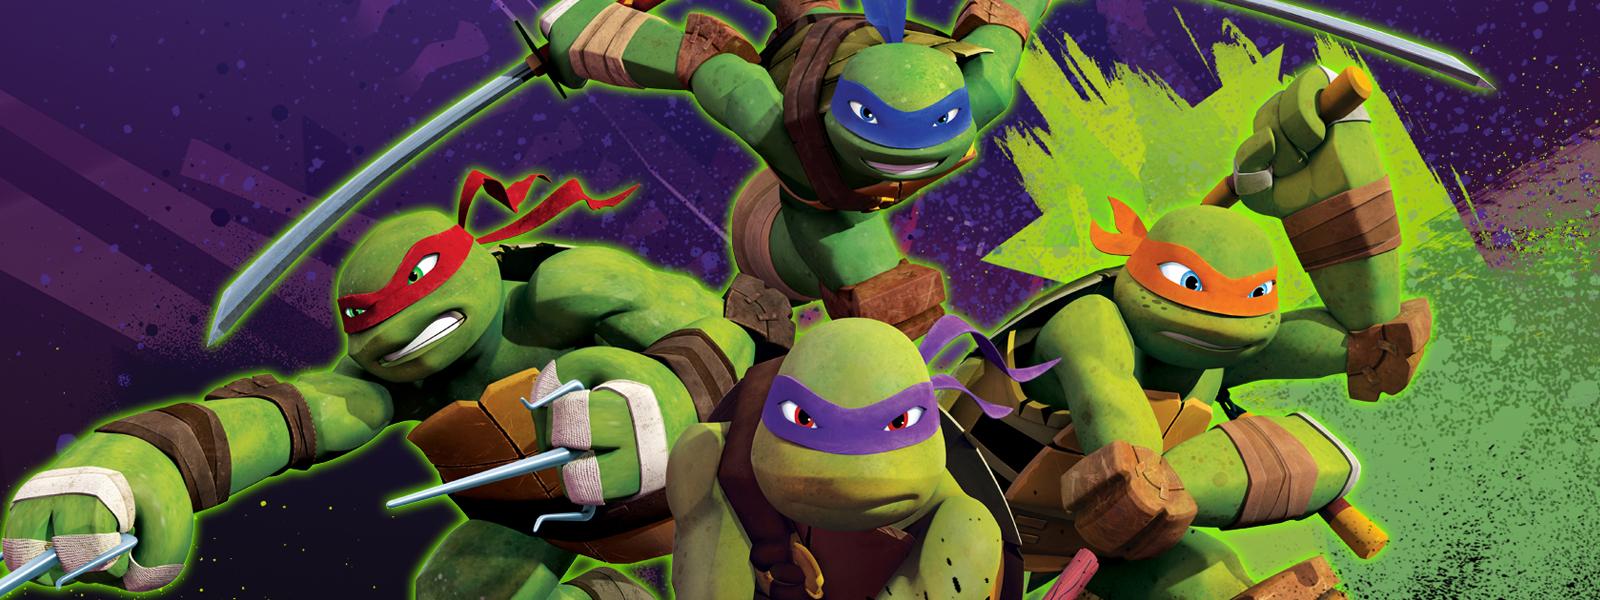 Teenaga mutant ninja turtles fan club - Home Facebook